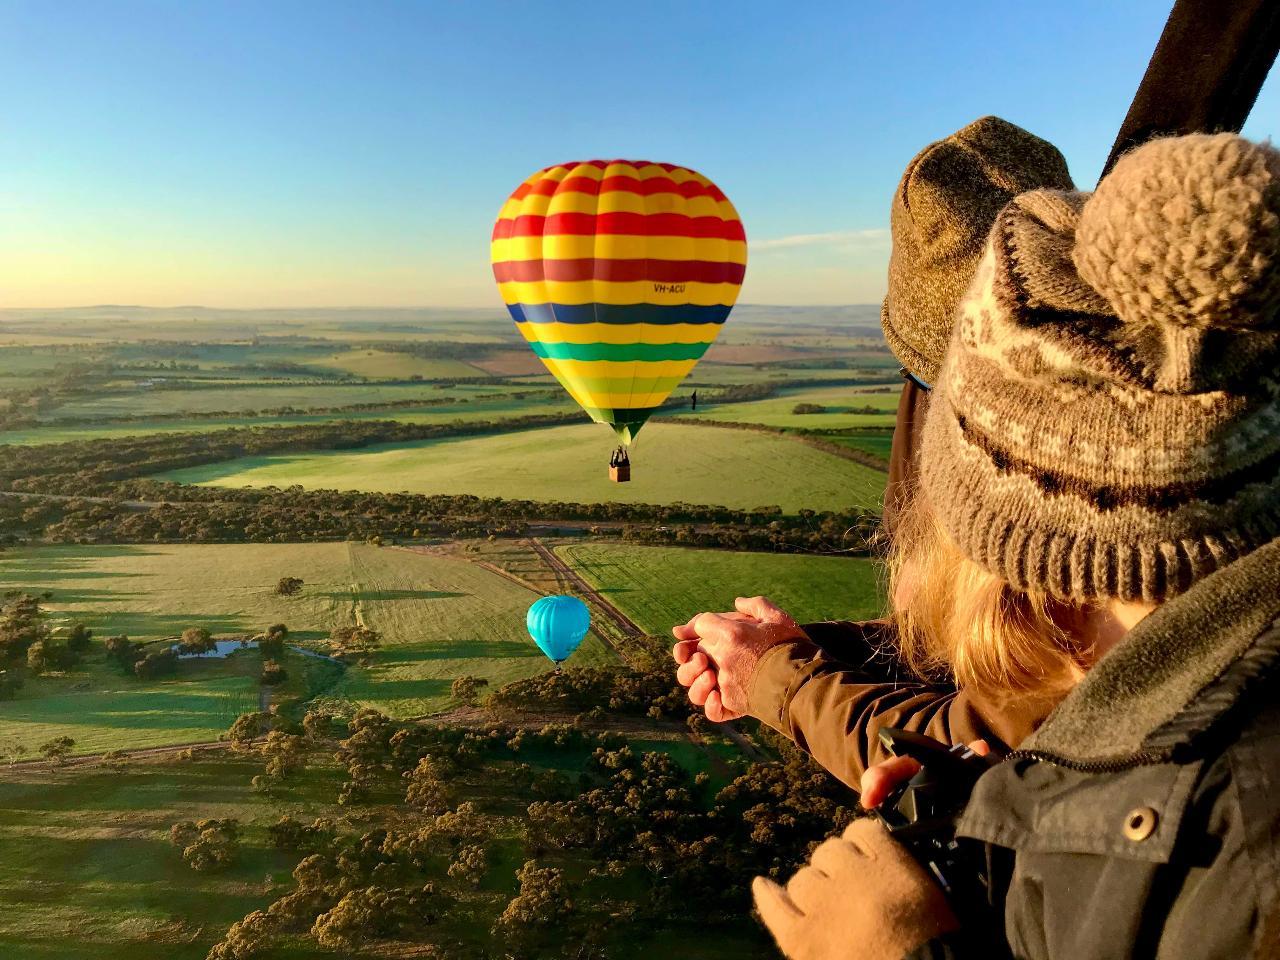 Avon Valley Balloon Flight - Weekends & Public Holidays